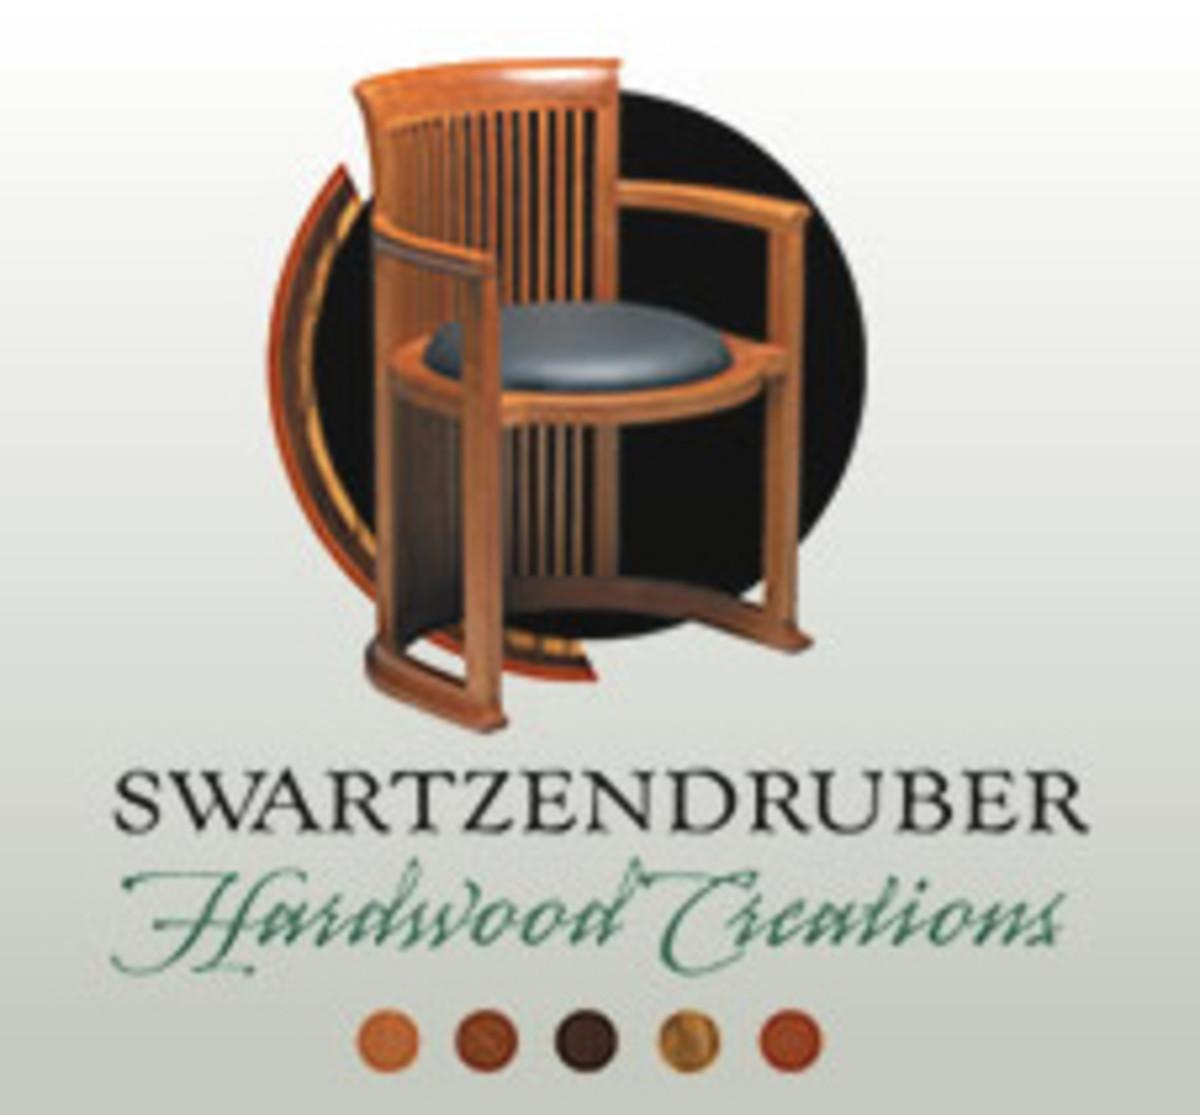 Swartzendruber Hardwood Creations logo